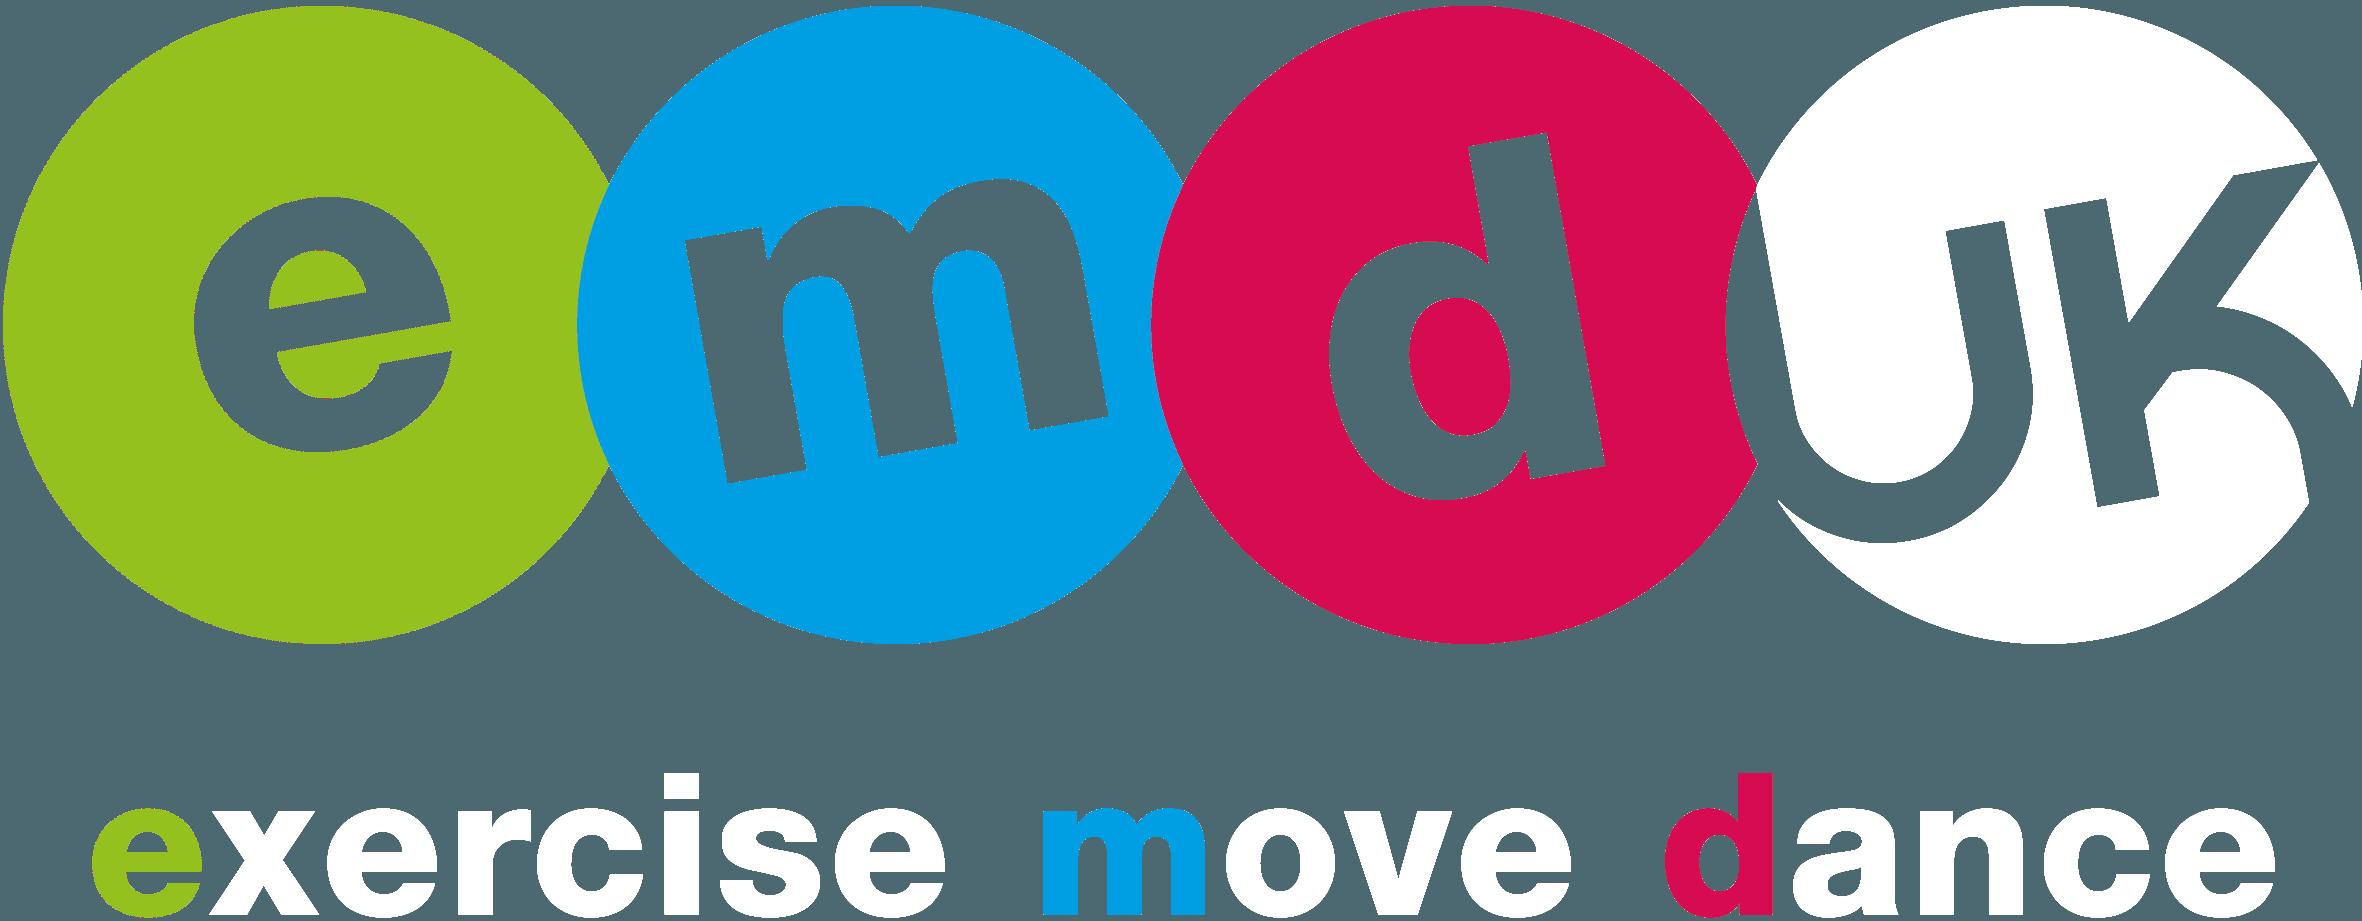 emd academy logo